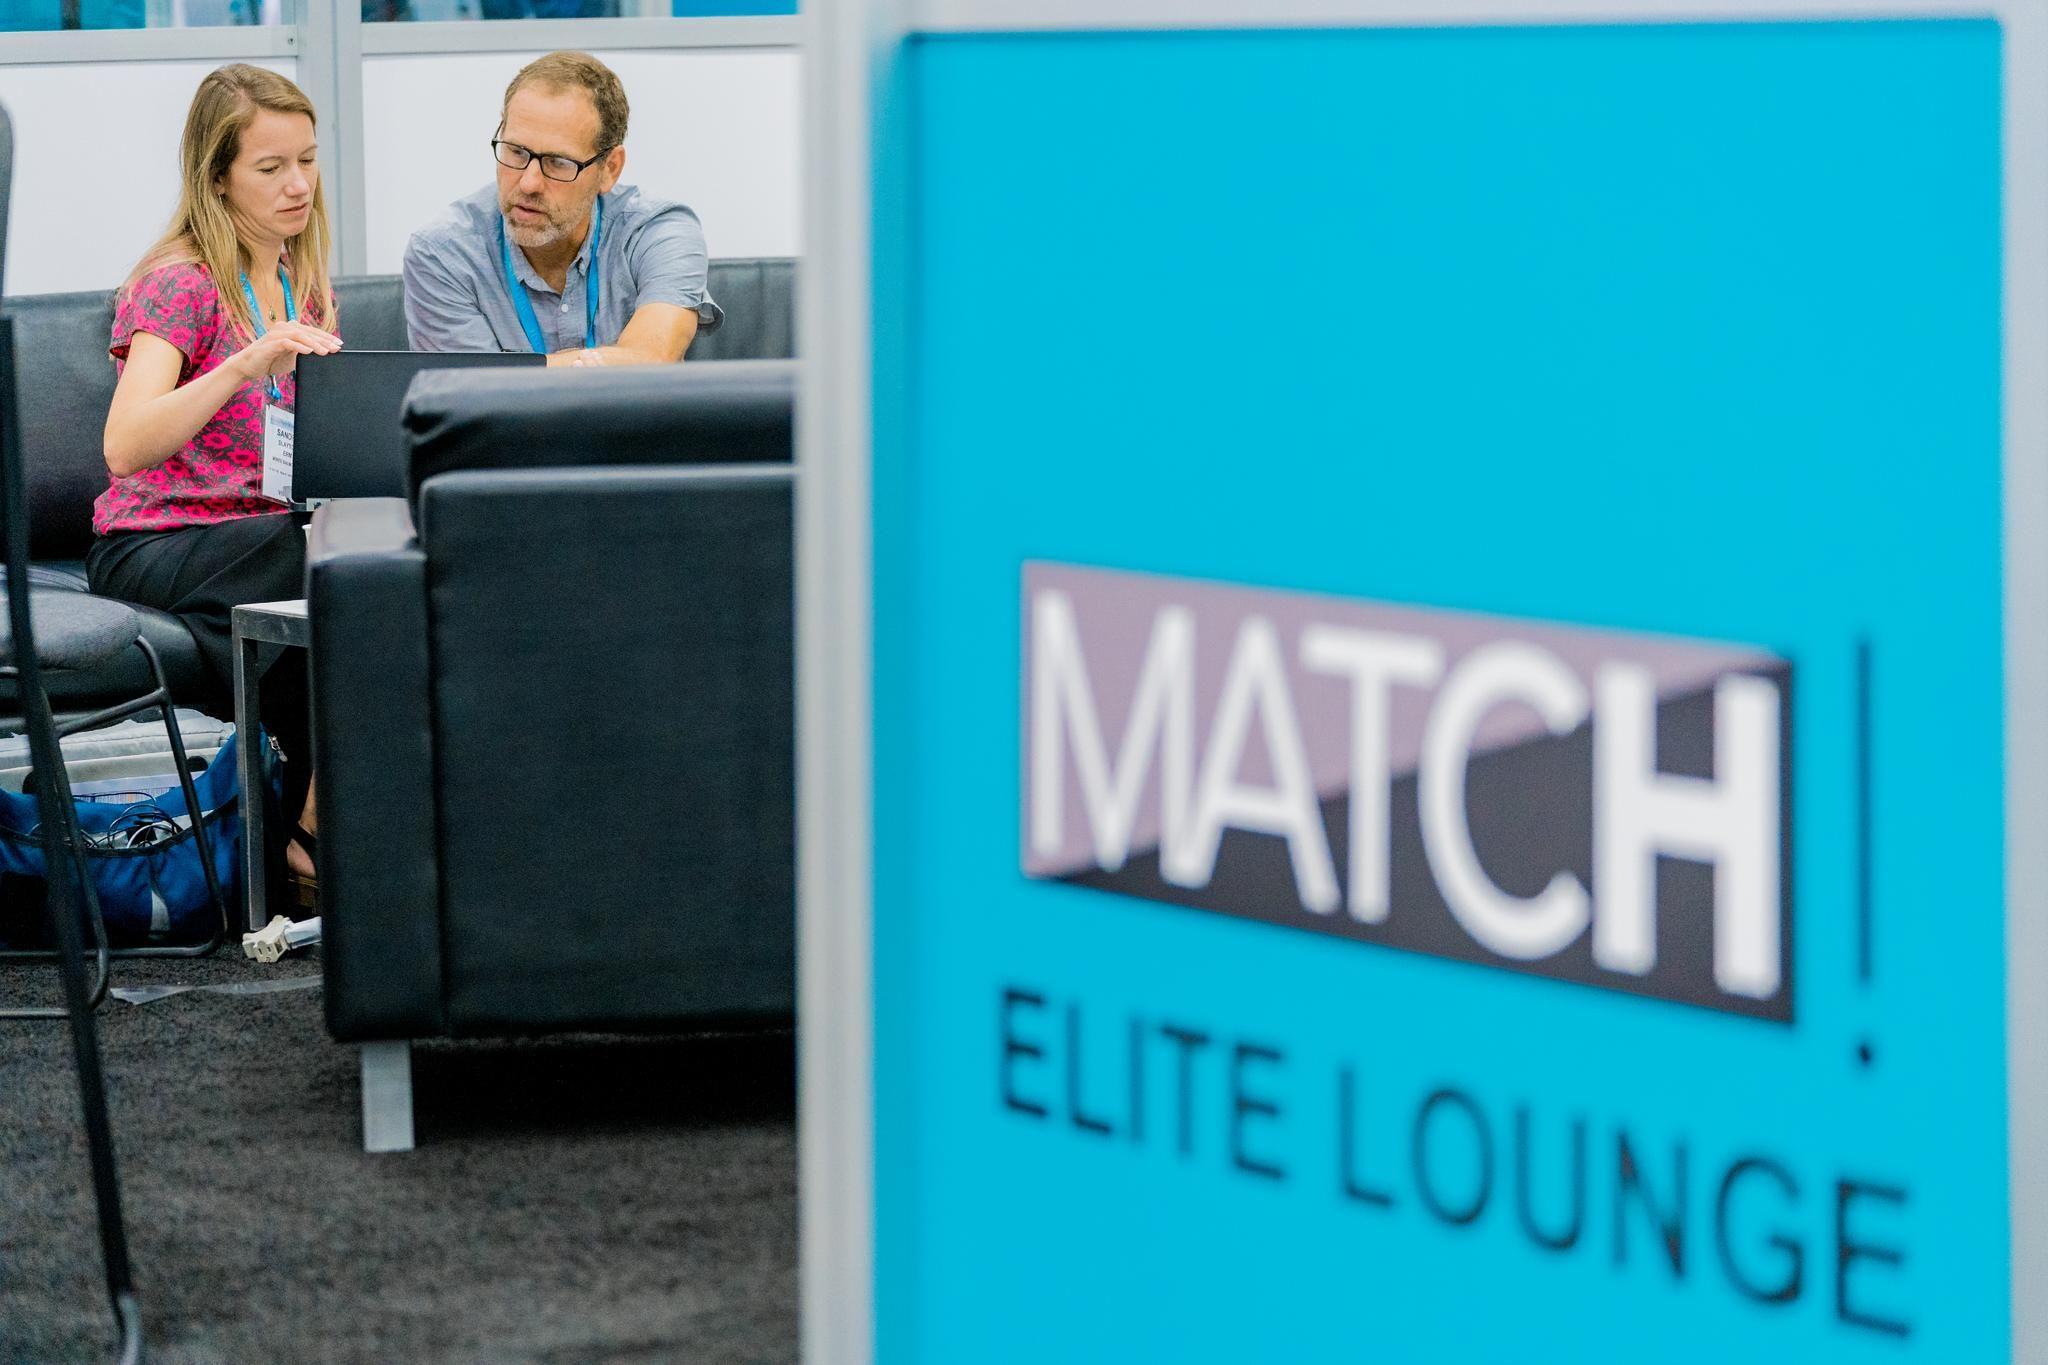 match elite